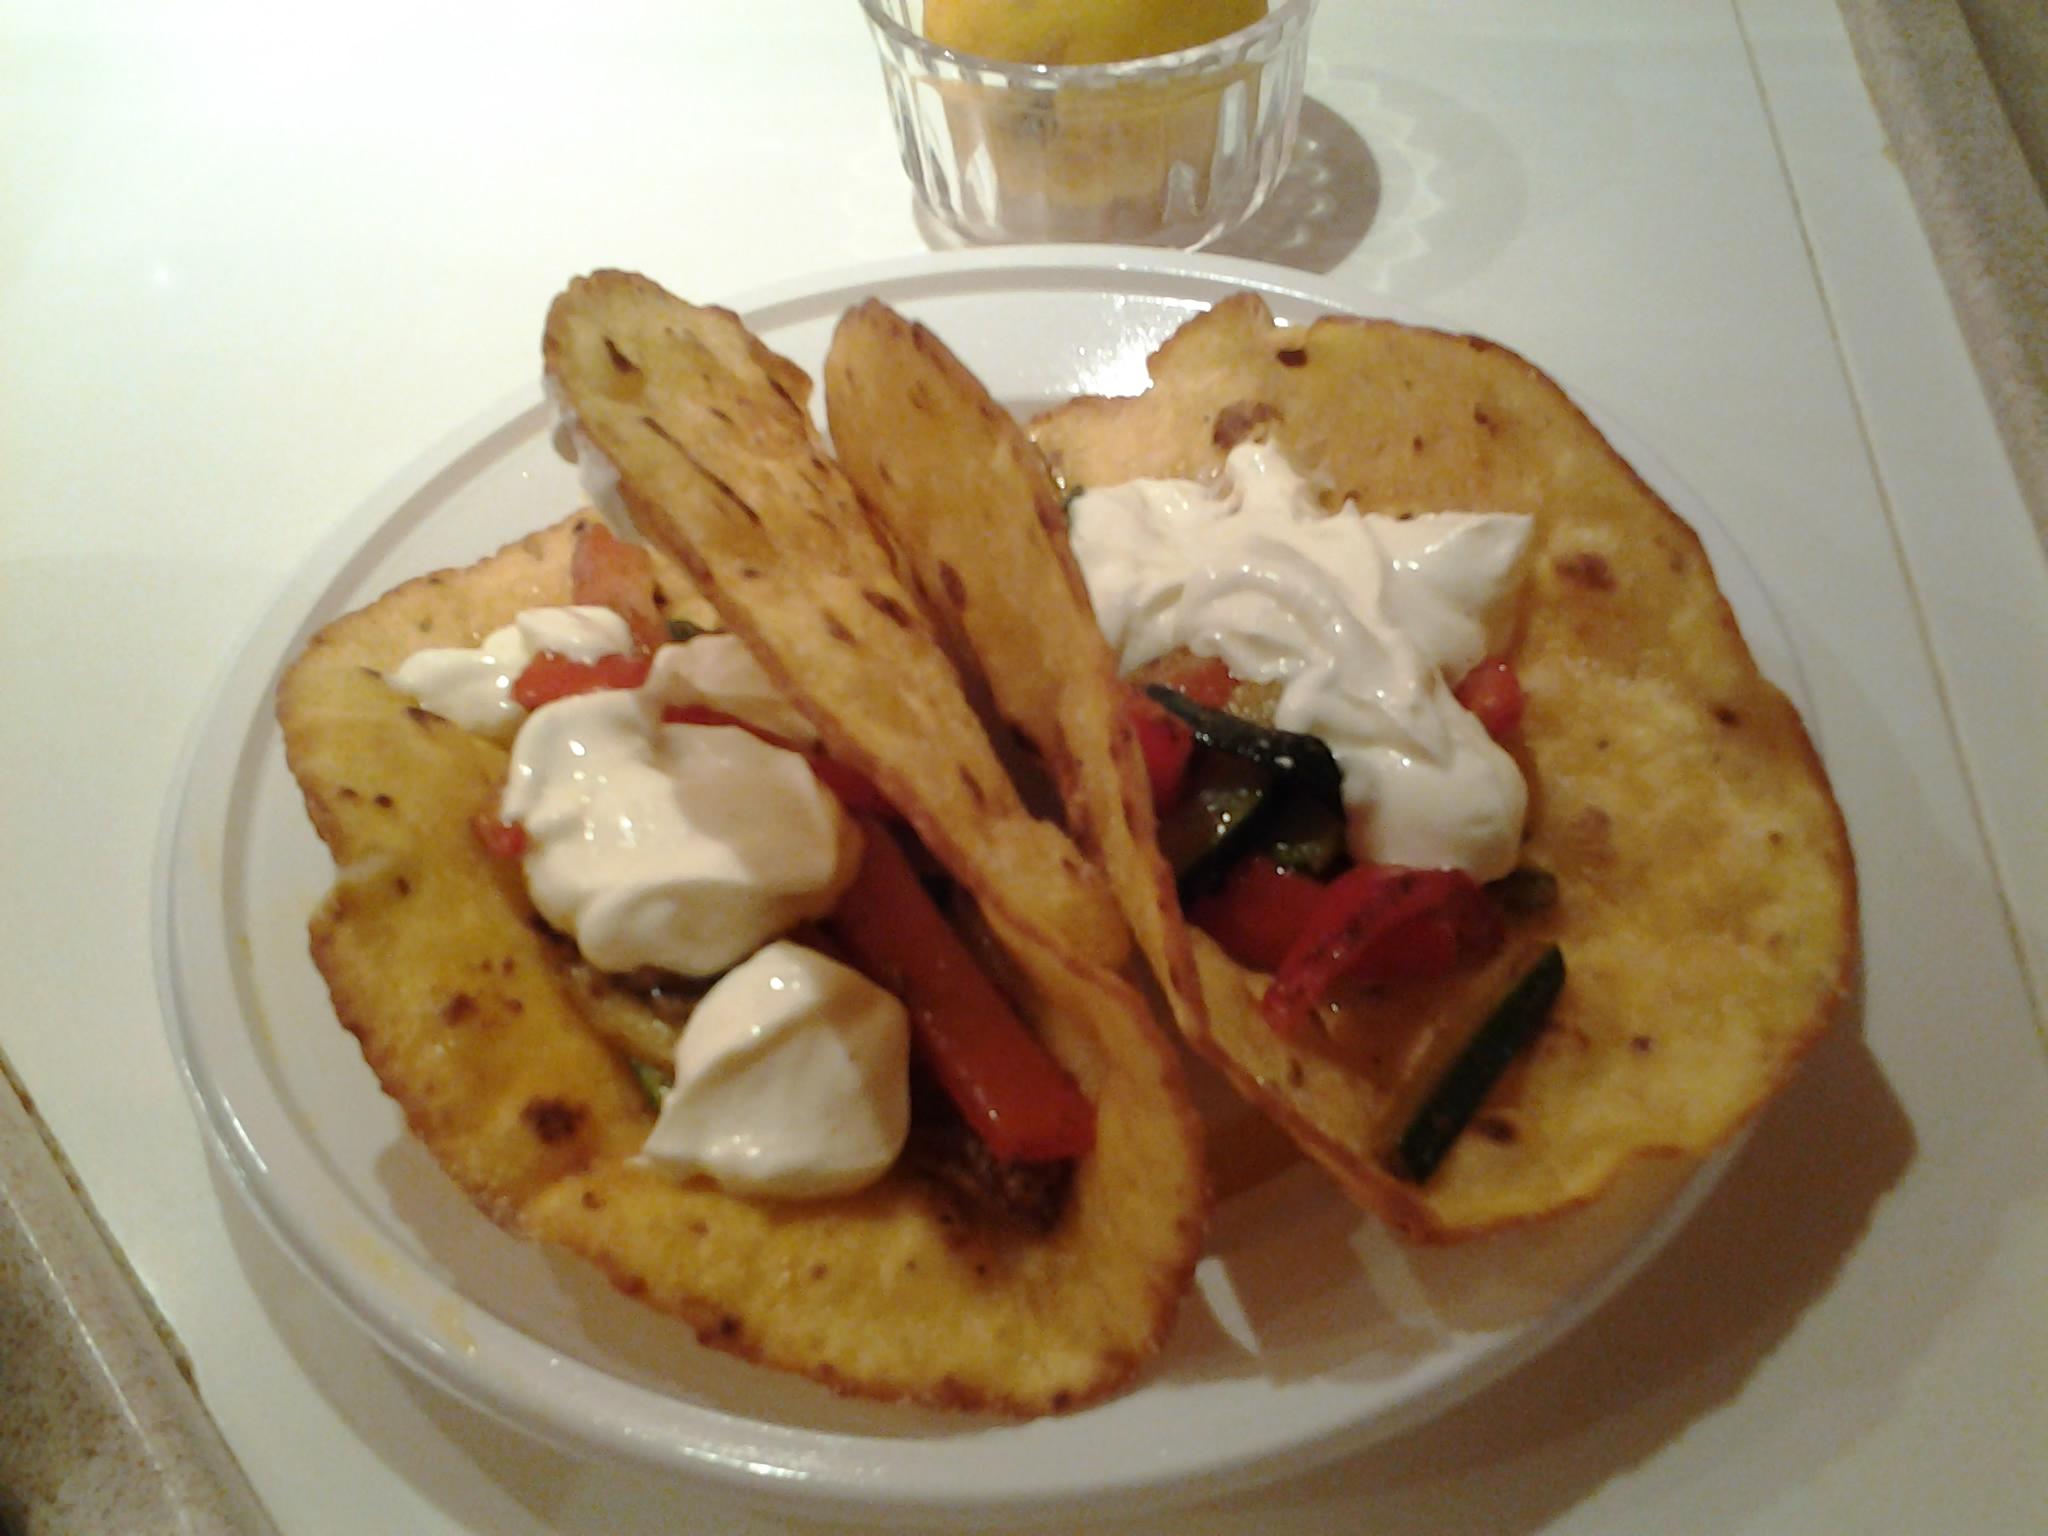 Tacos, verdure all'orientale, yogurt greco e succo di limone